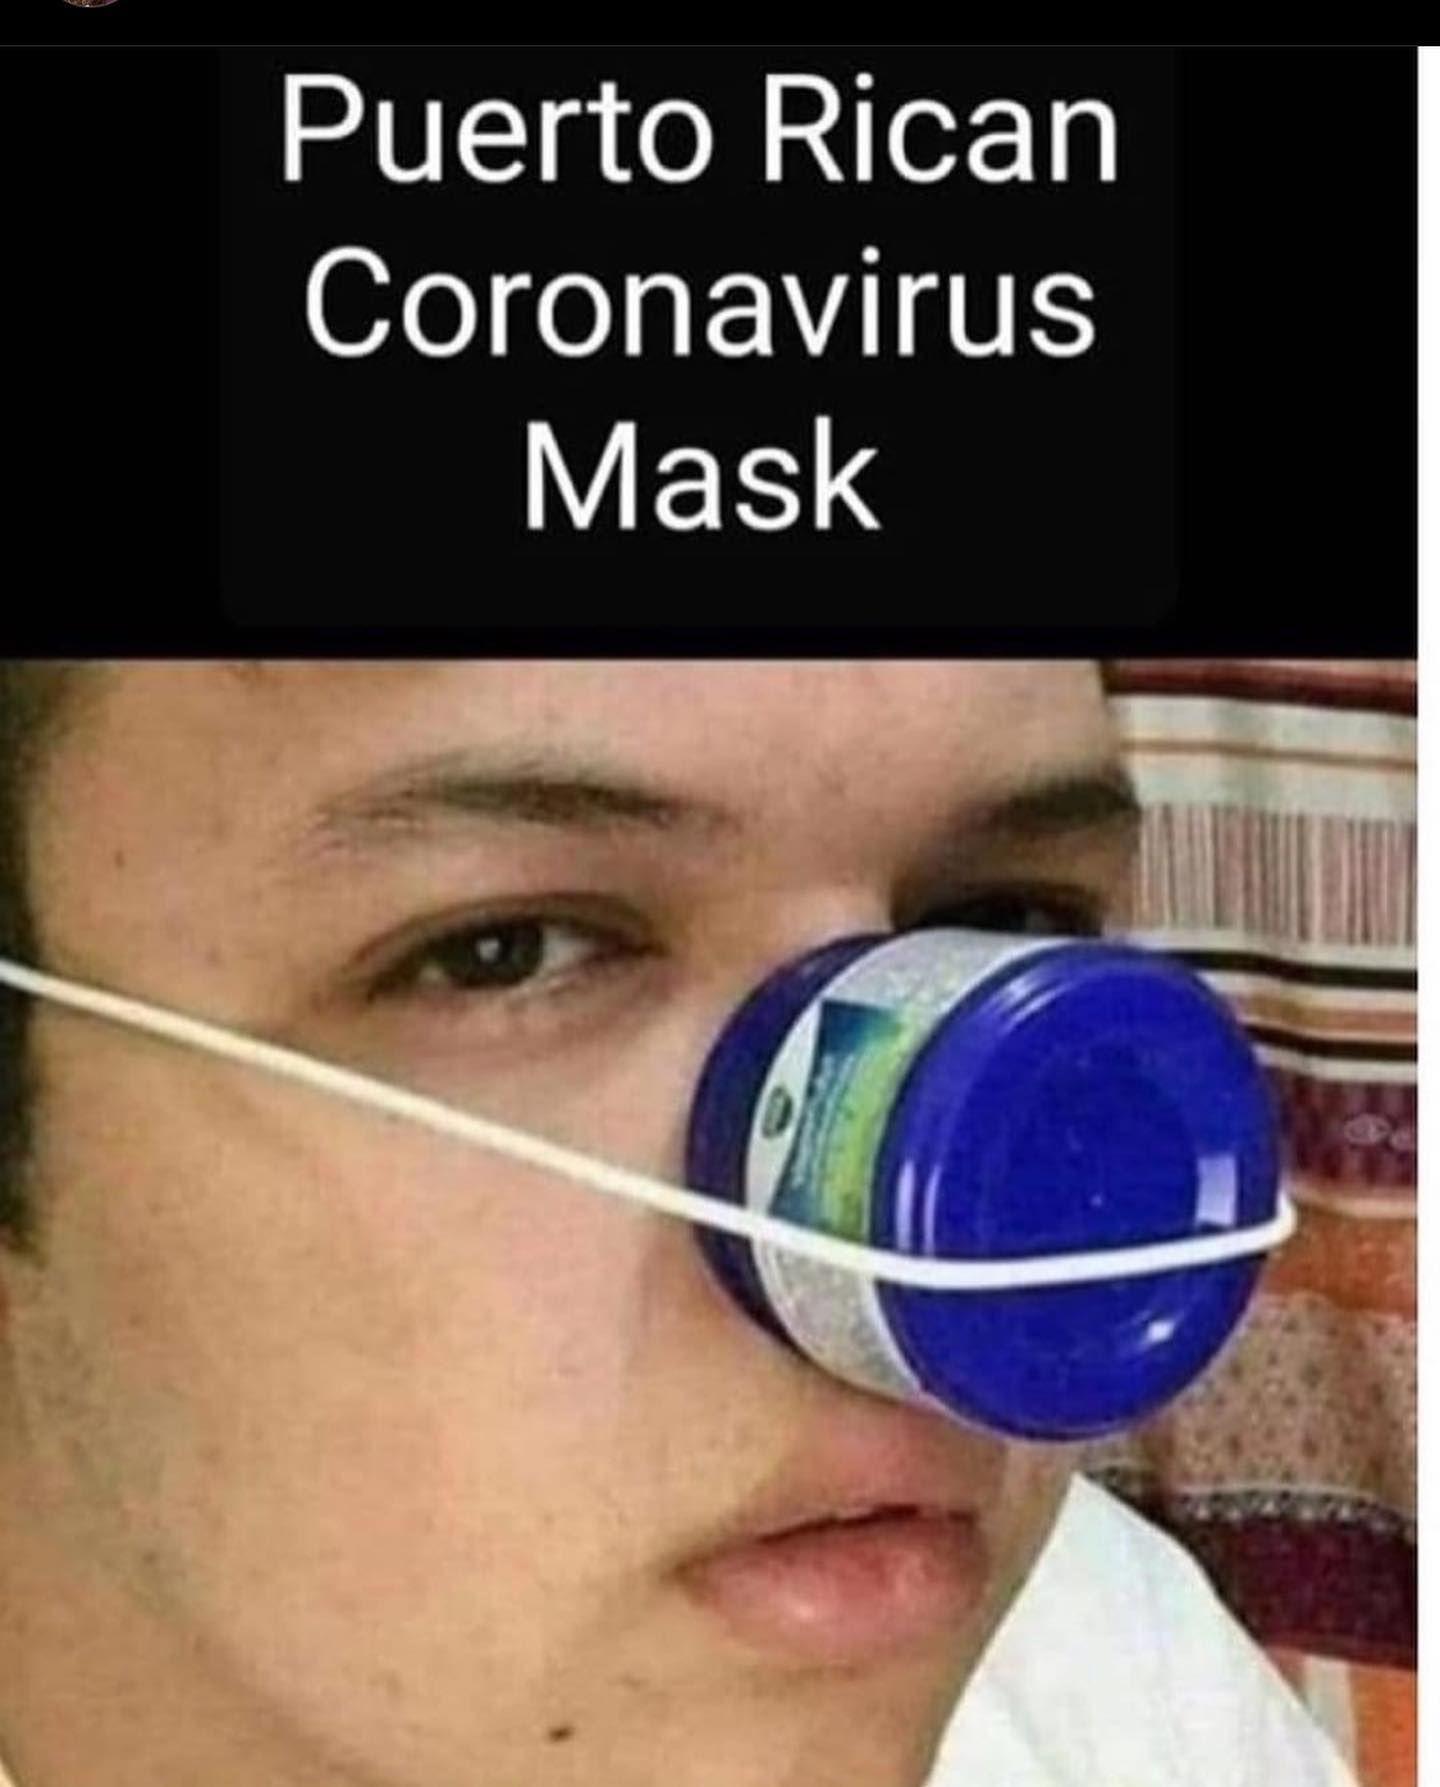 Uhhh How Accurate Is This Boricua Boricuasbelike Coronamemes Reggaeton Puertoricansbeli Puerto Rican Jokes Mexican Jokes Puerto Rican Memes